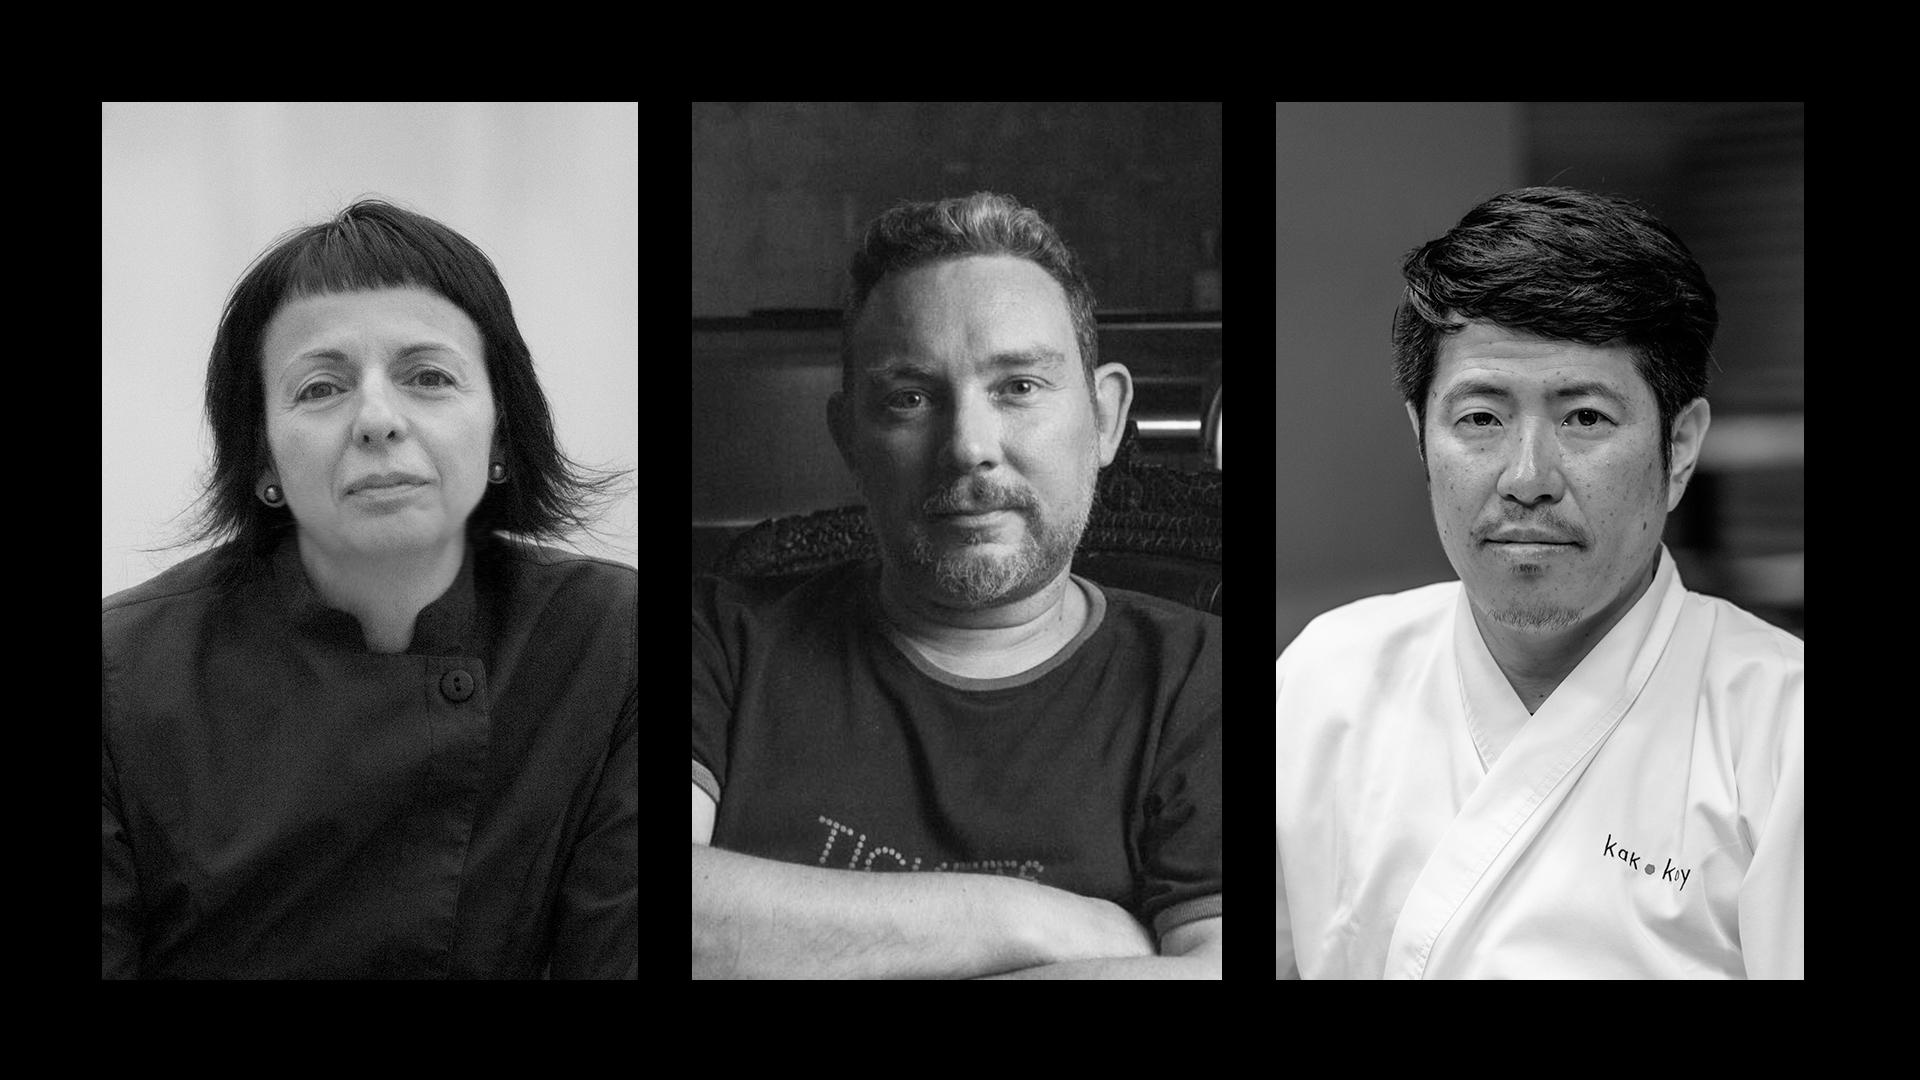 Sónar 2018 presents three Michelin star chefs